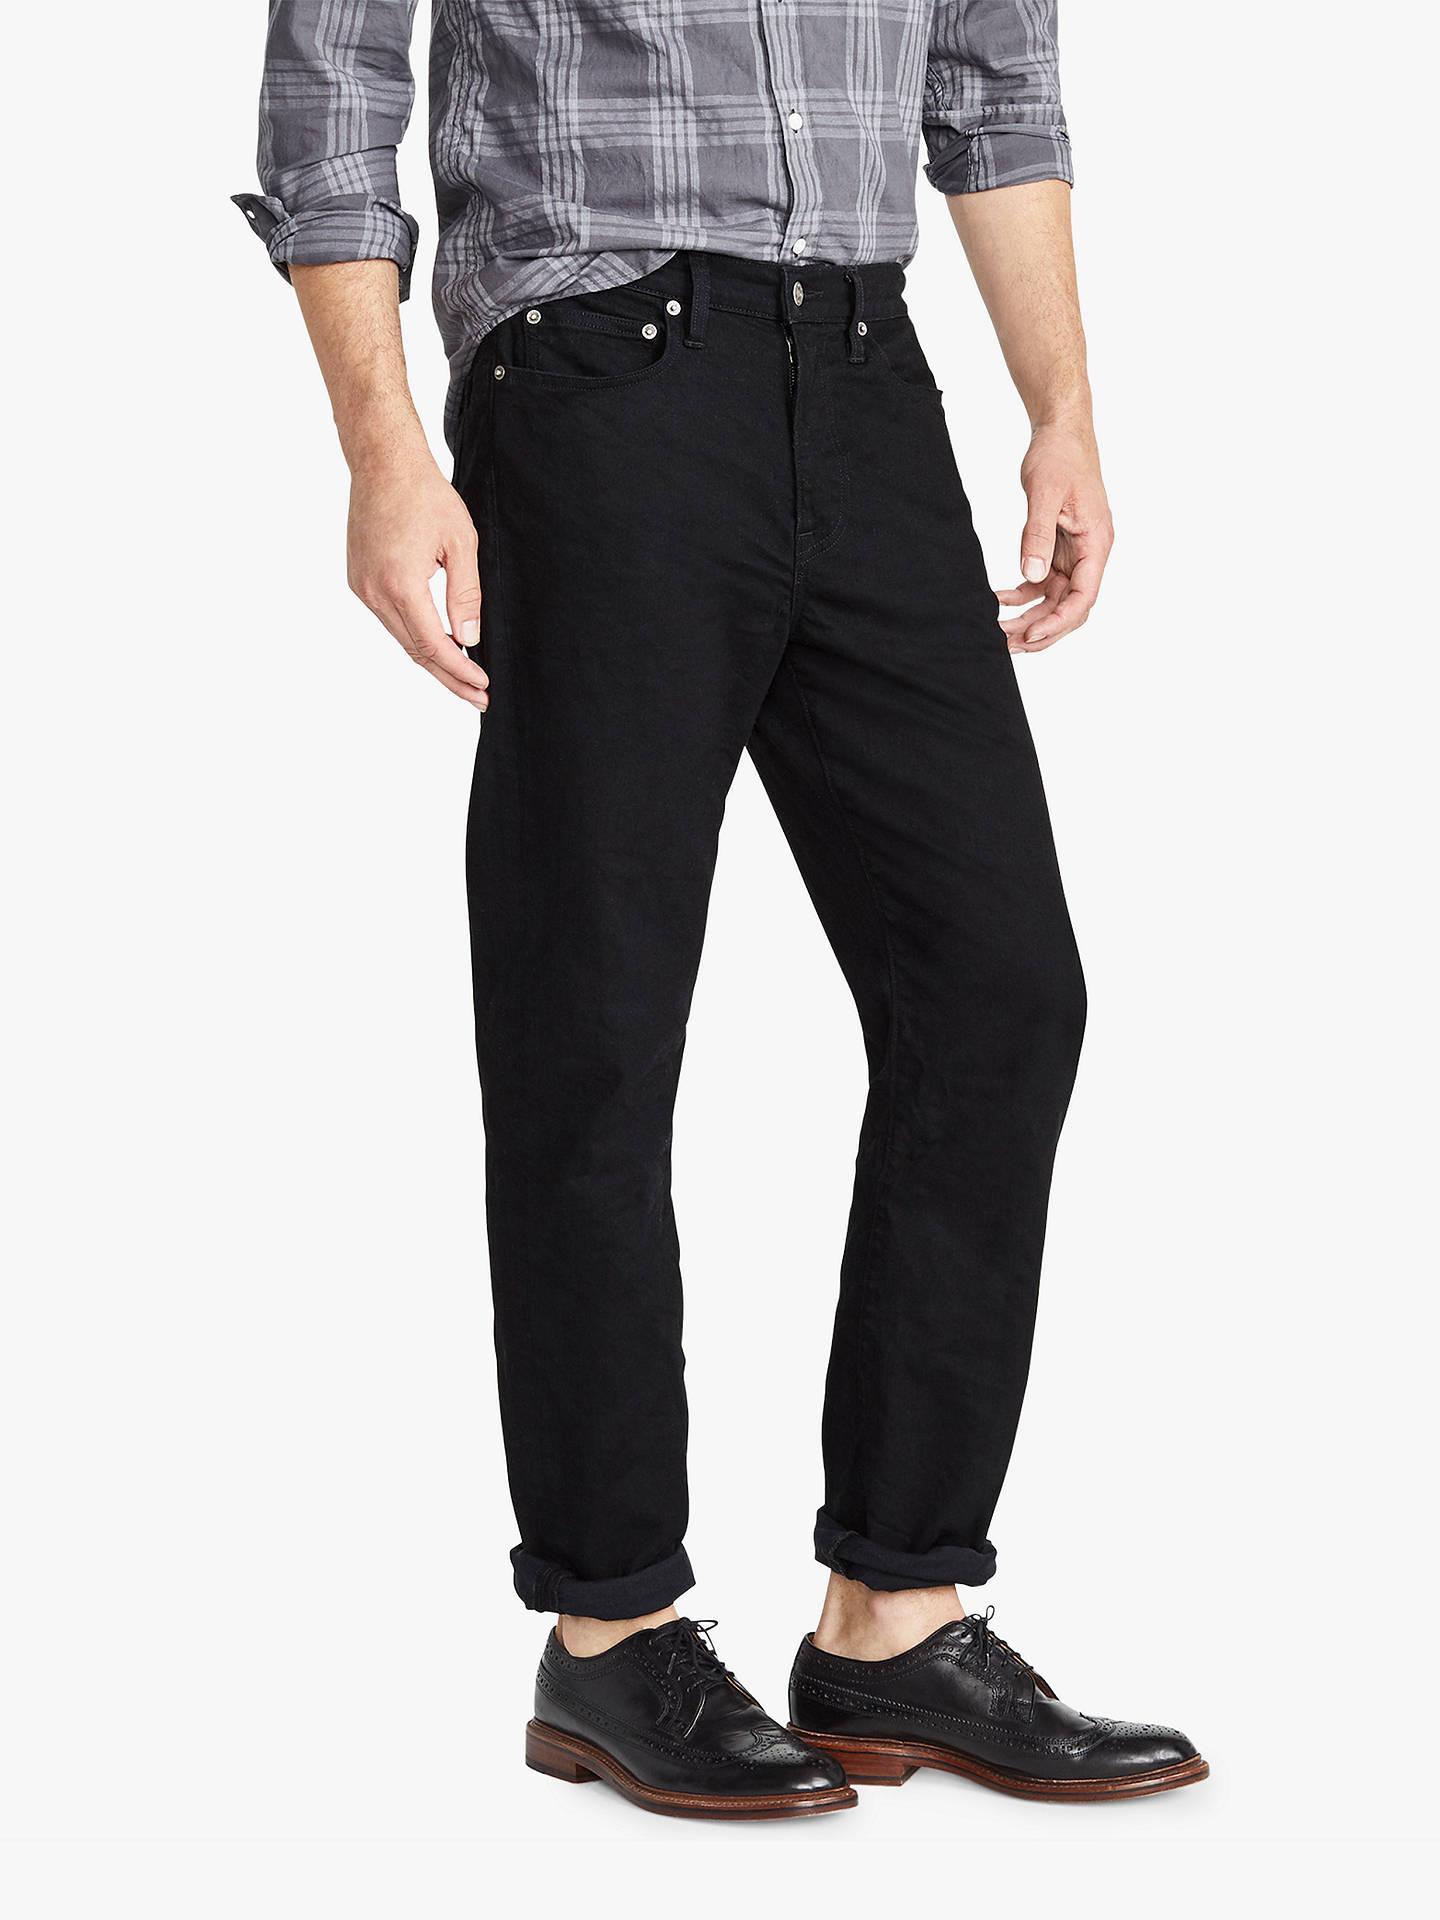 3f0f073bb6 Buy J.Crew 770 Stretch Straight Fit Jeans, Black Rinse, 30R Online at ...